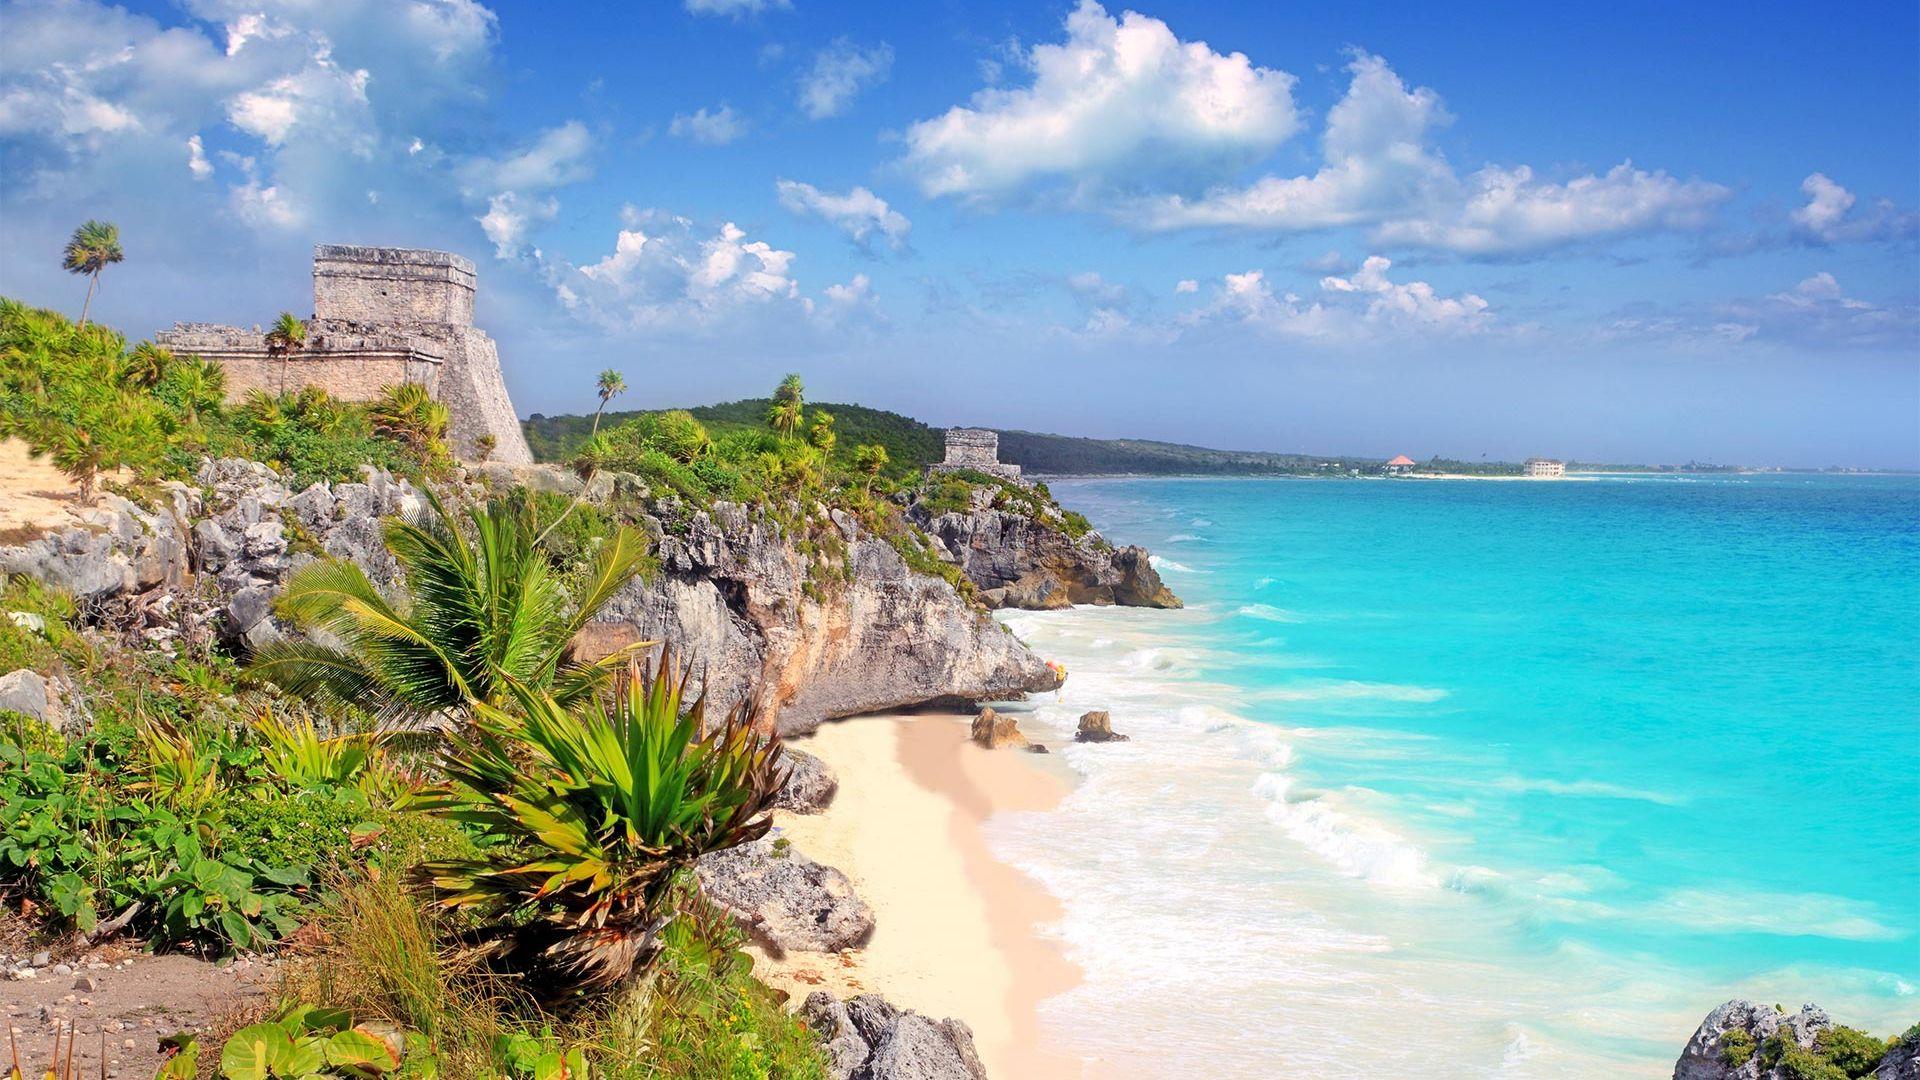 Sejur plaja Cancun, Riviera Maya, 12 zile - Iulie 2021